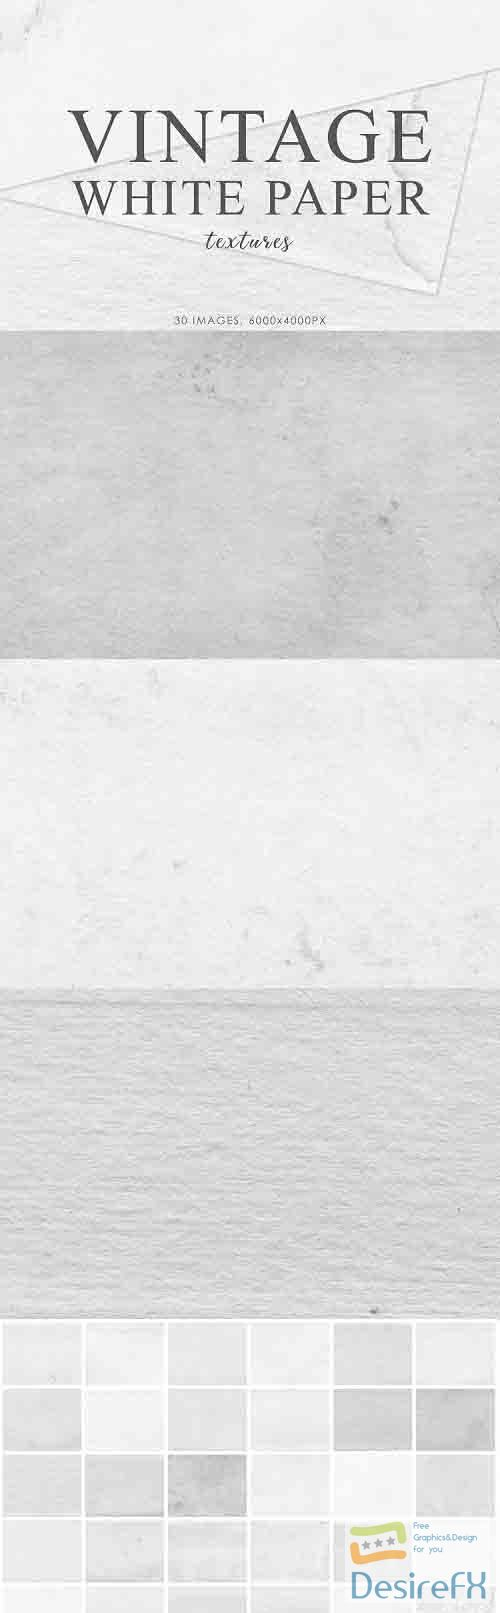 White Vintage Paper Textures 2 - 728417